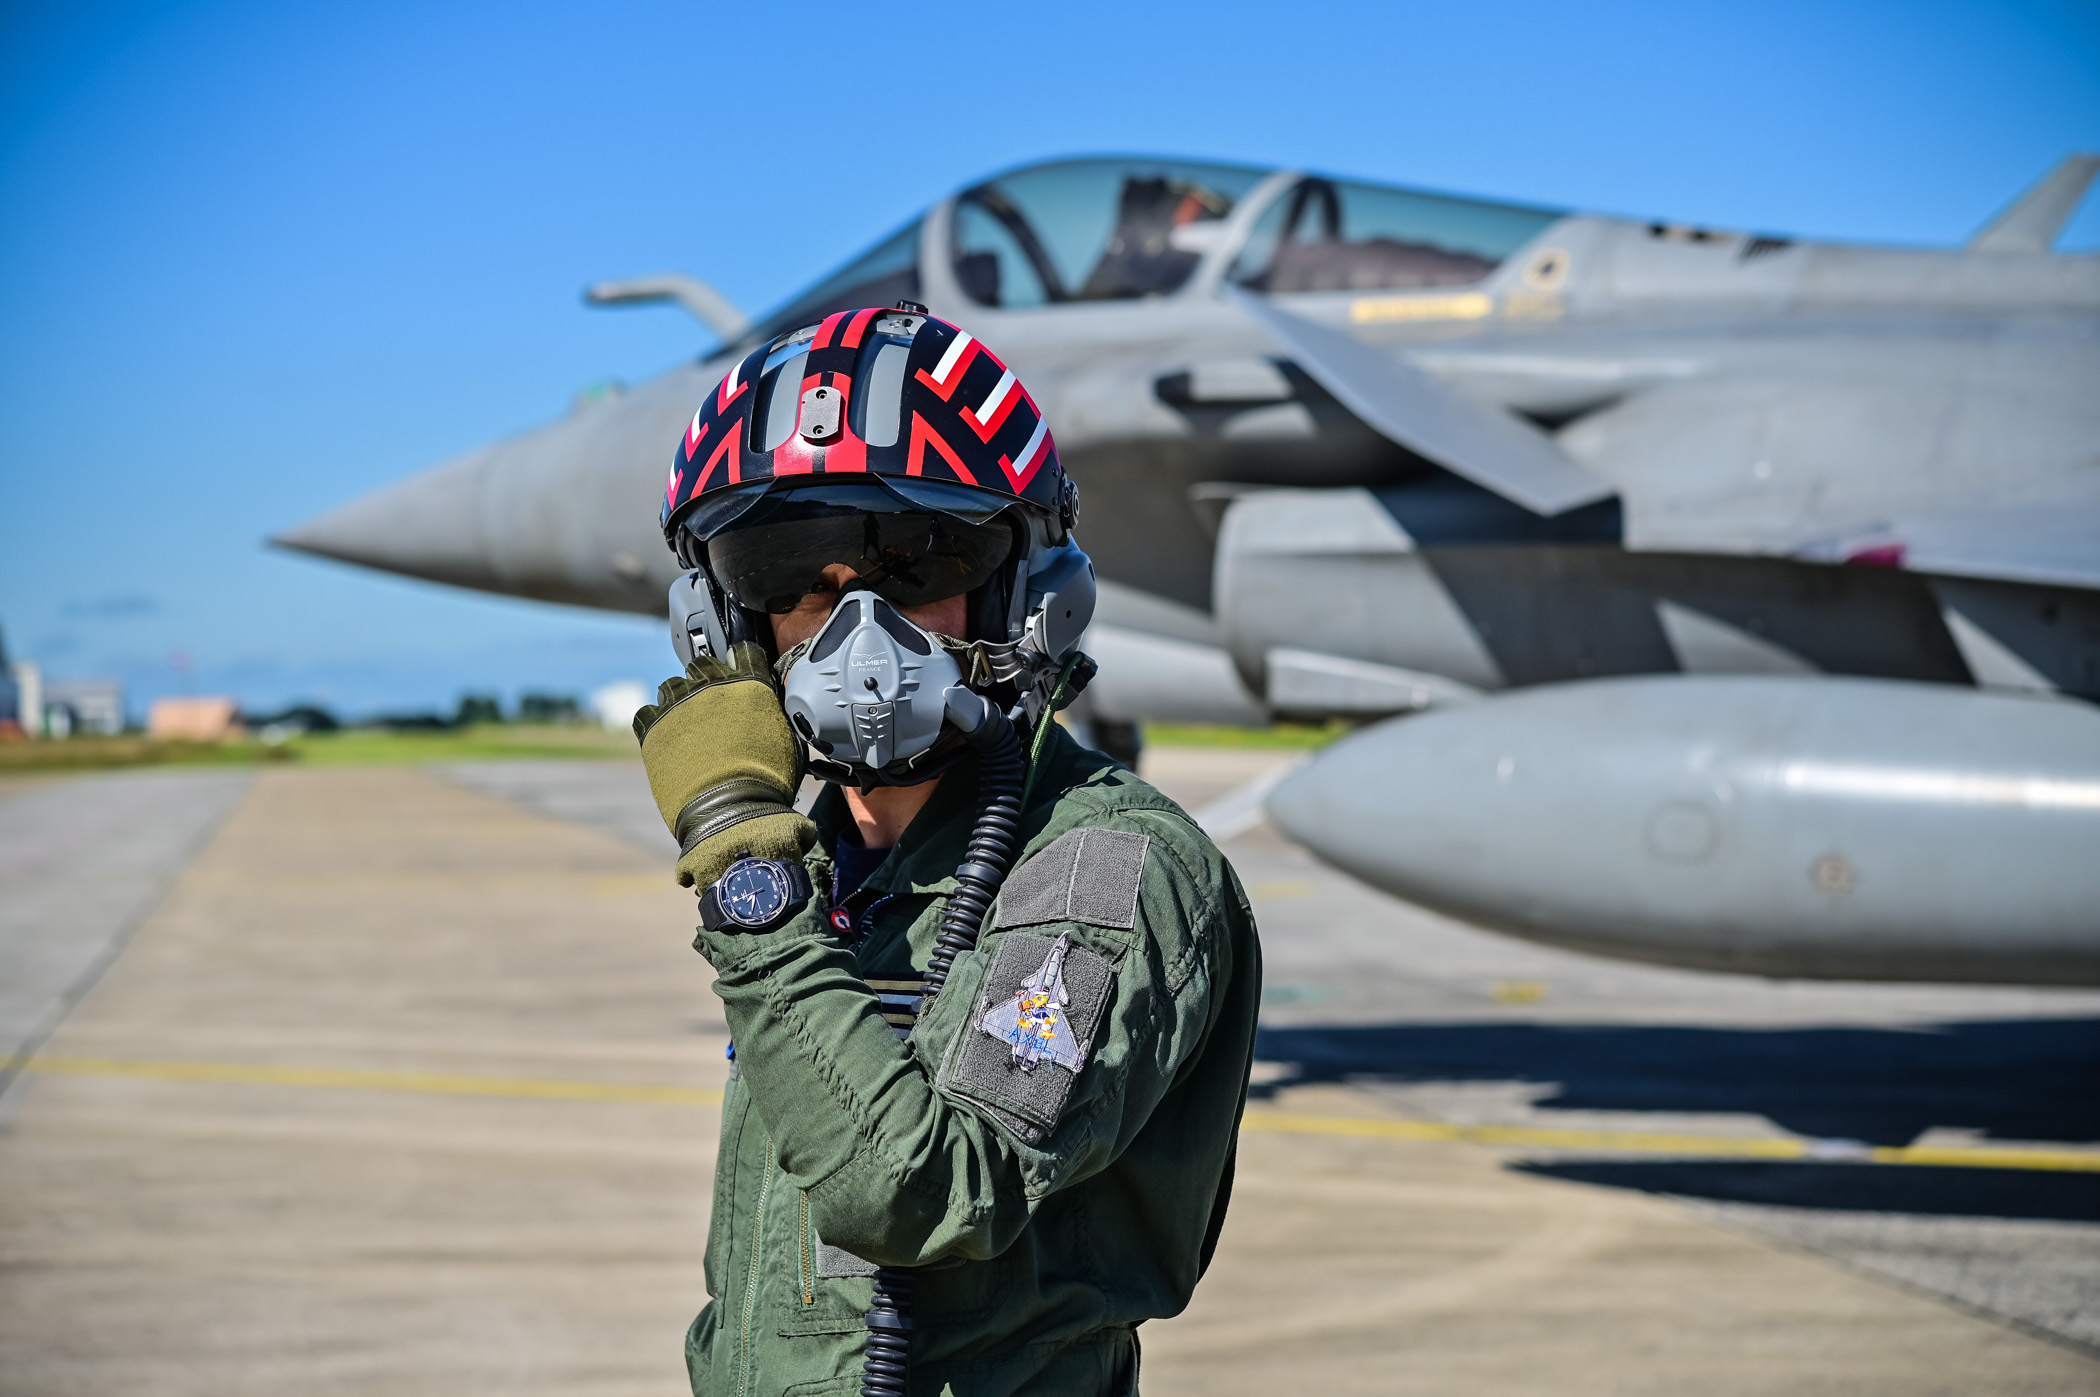 Rafale Pilot Etienne Bauer Testing IWC Big Pilot Shock Absorber XPL